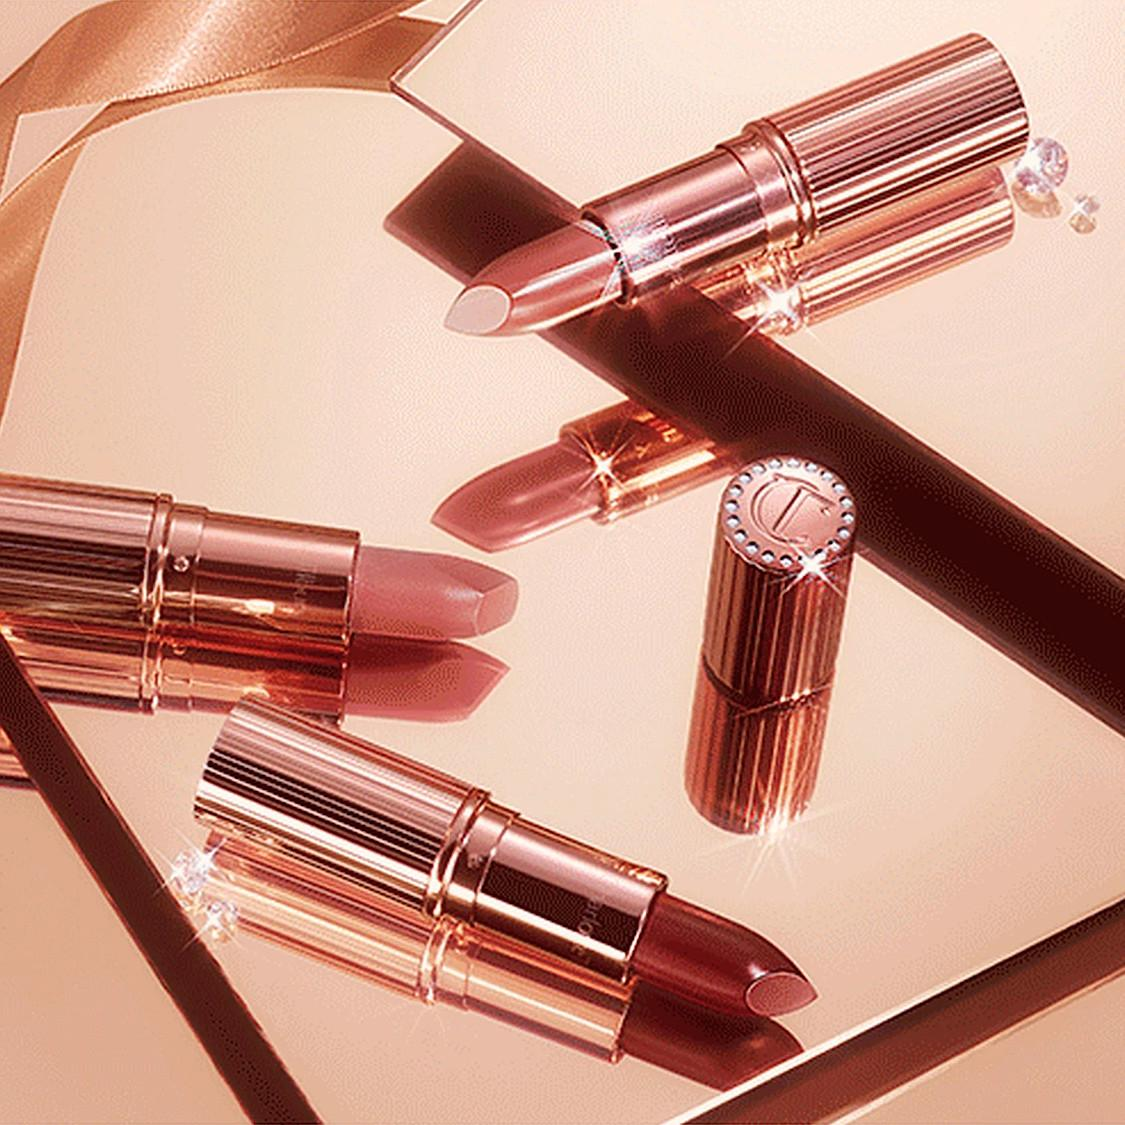 Charlotte Tilbury Super Nude Lipsticks Post Cover